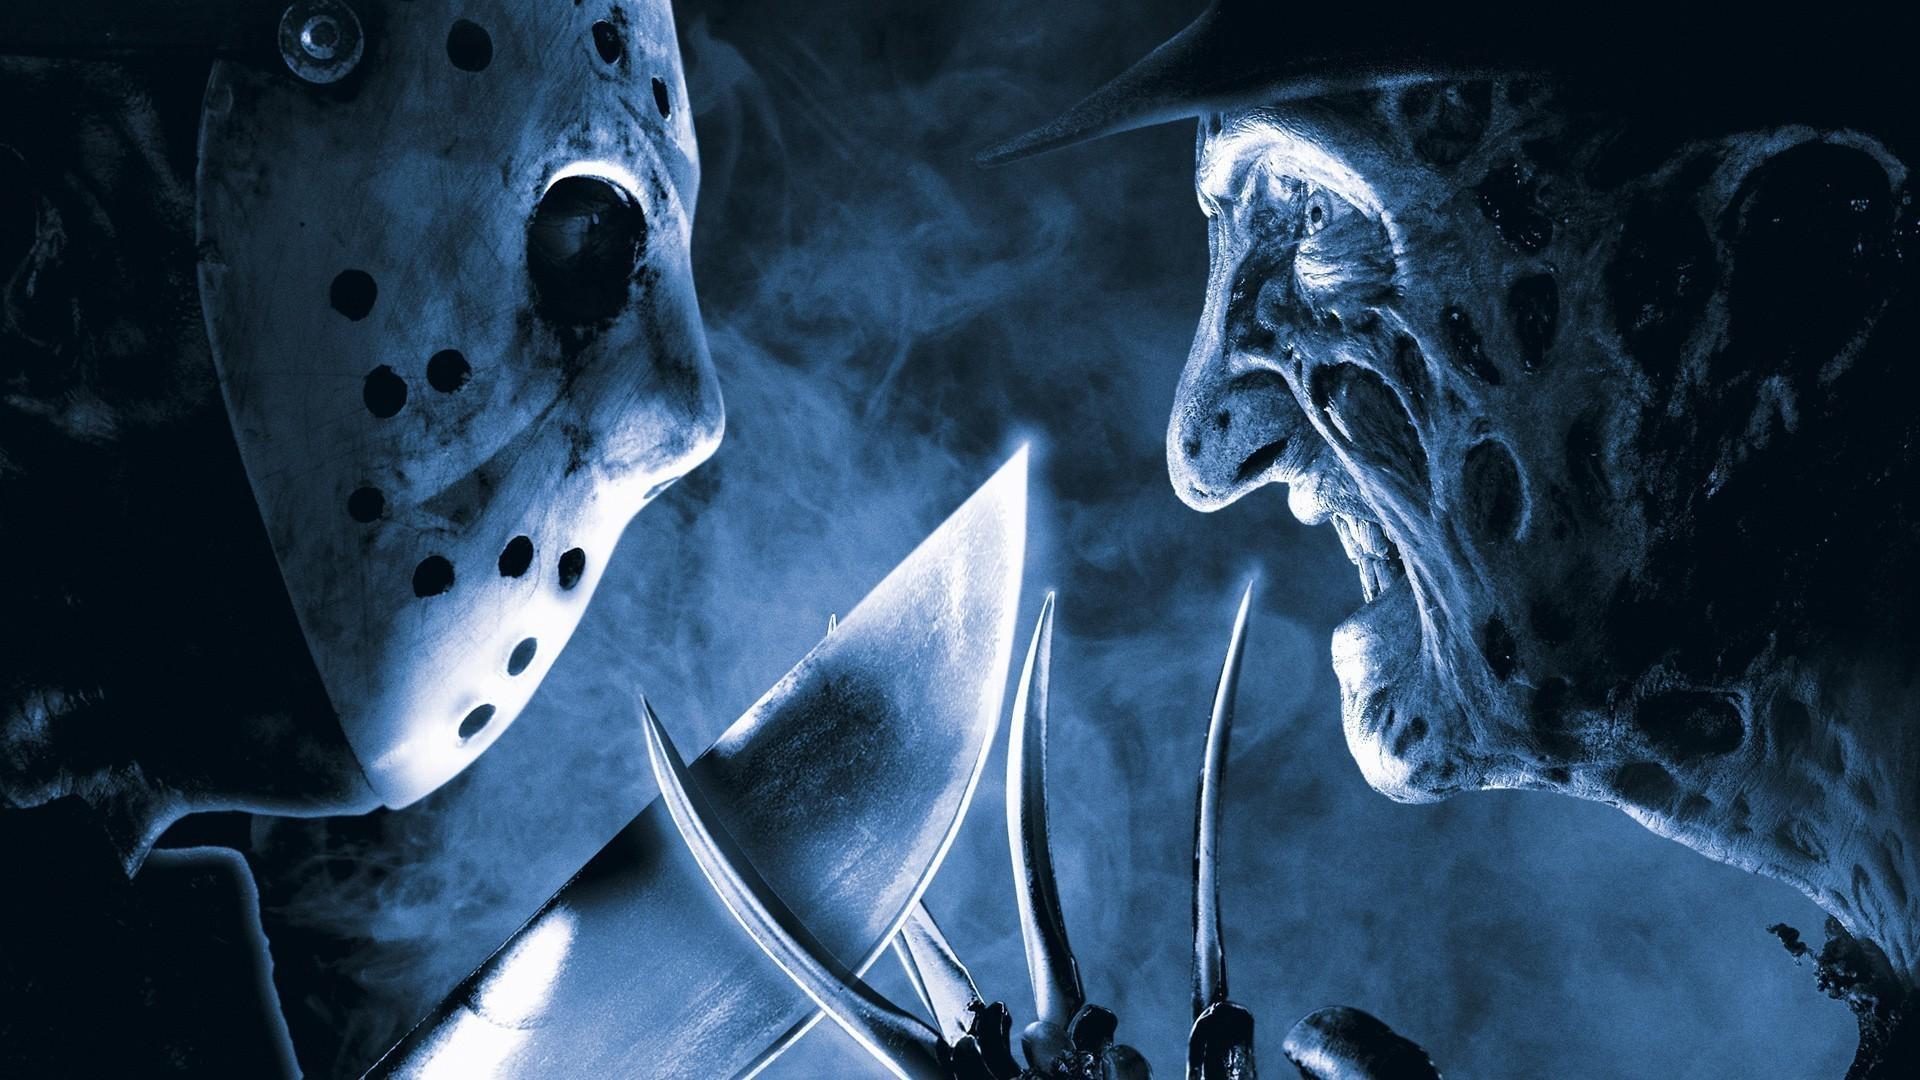 Freddy Krueger Wallpaper HD (43+ images)